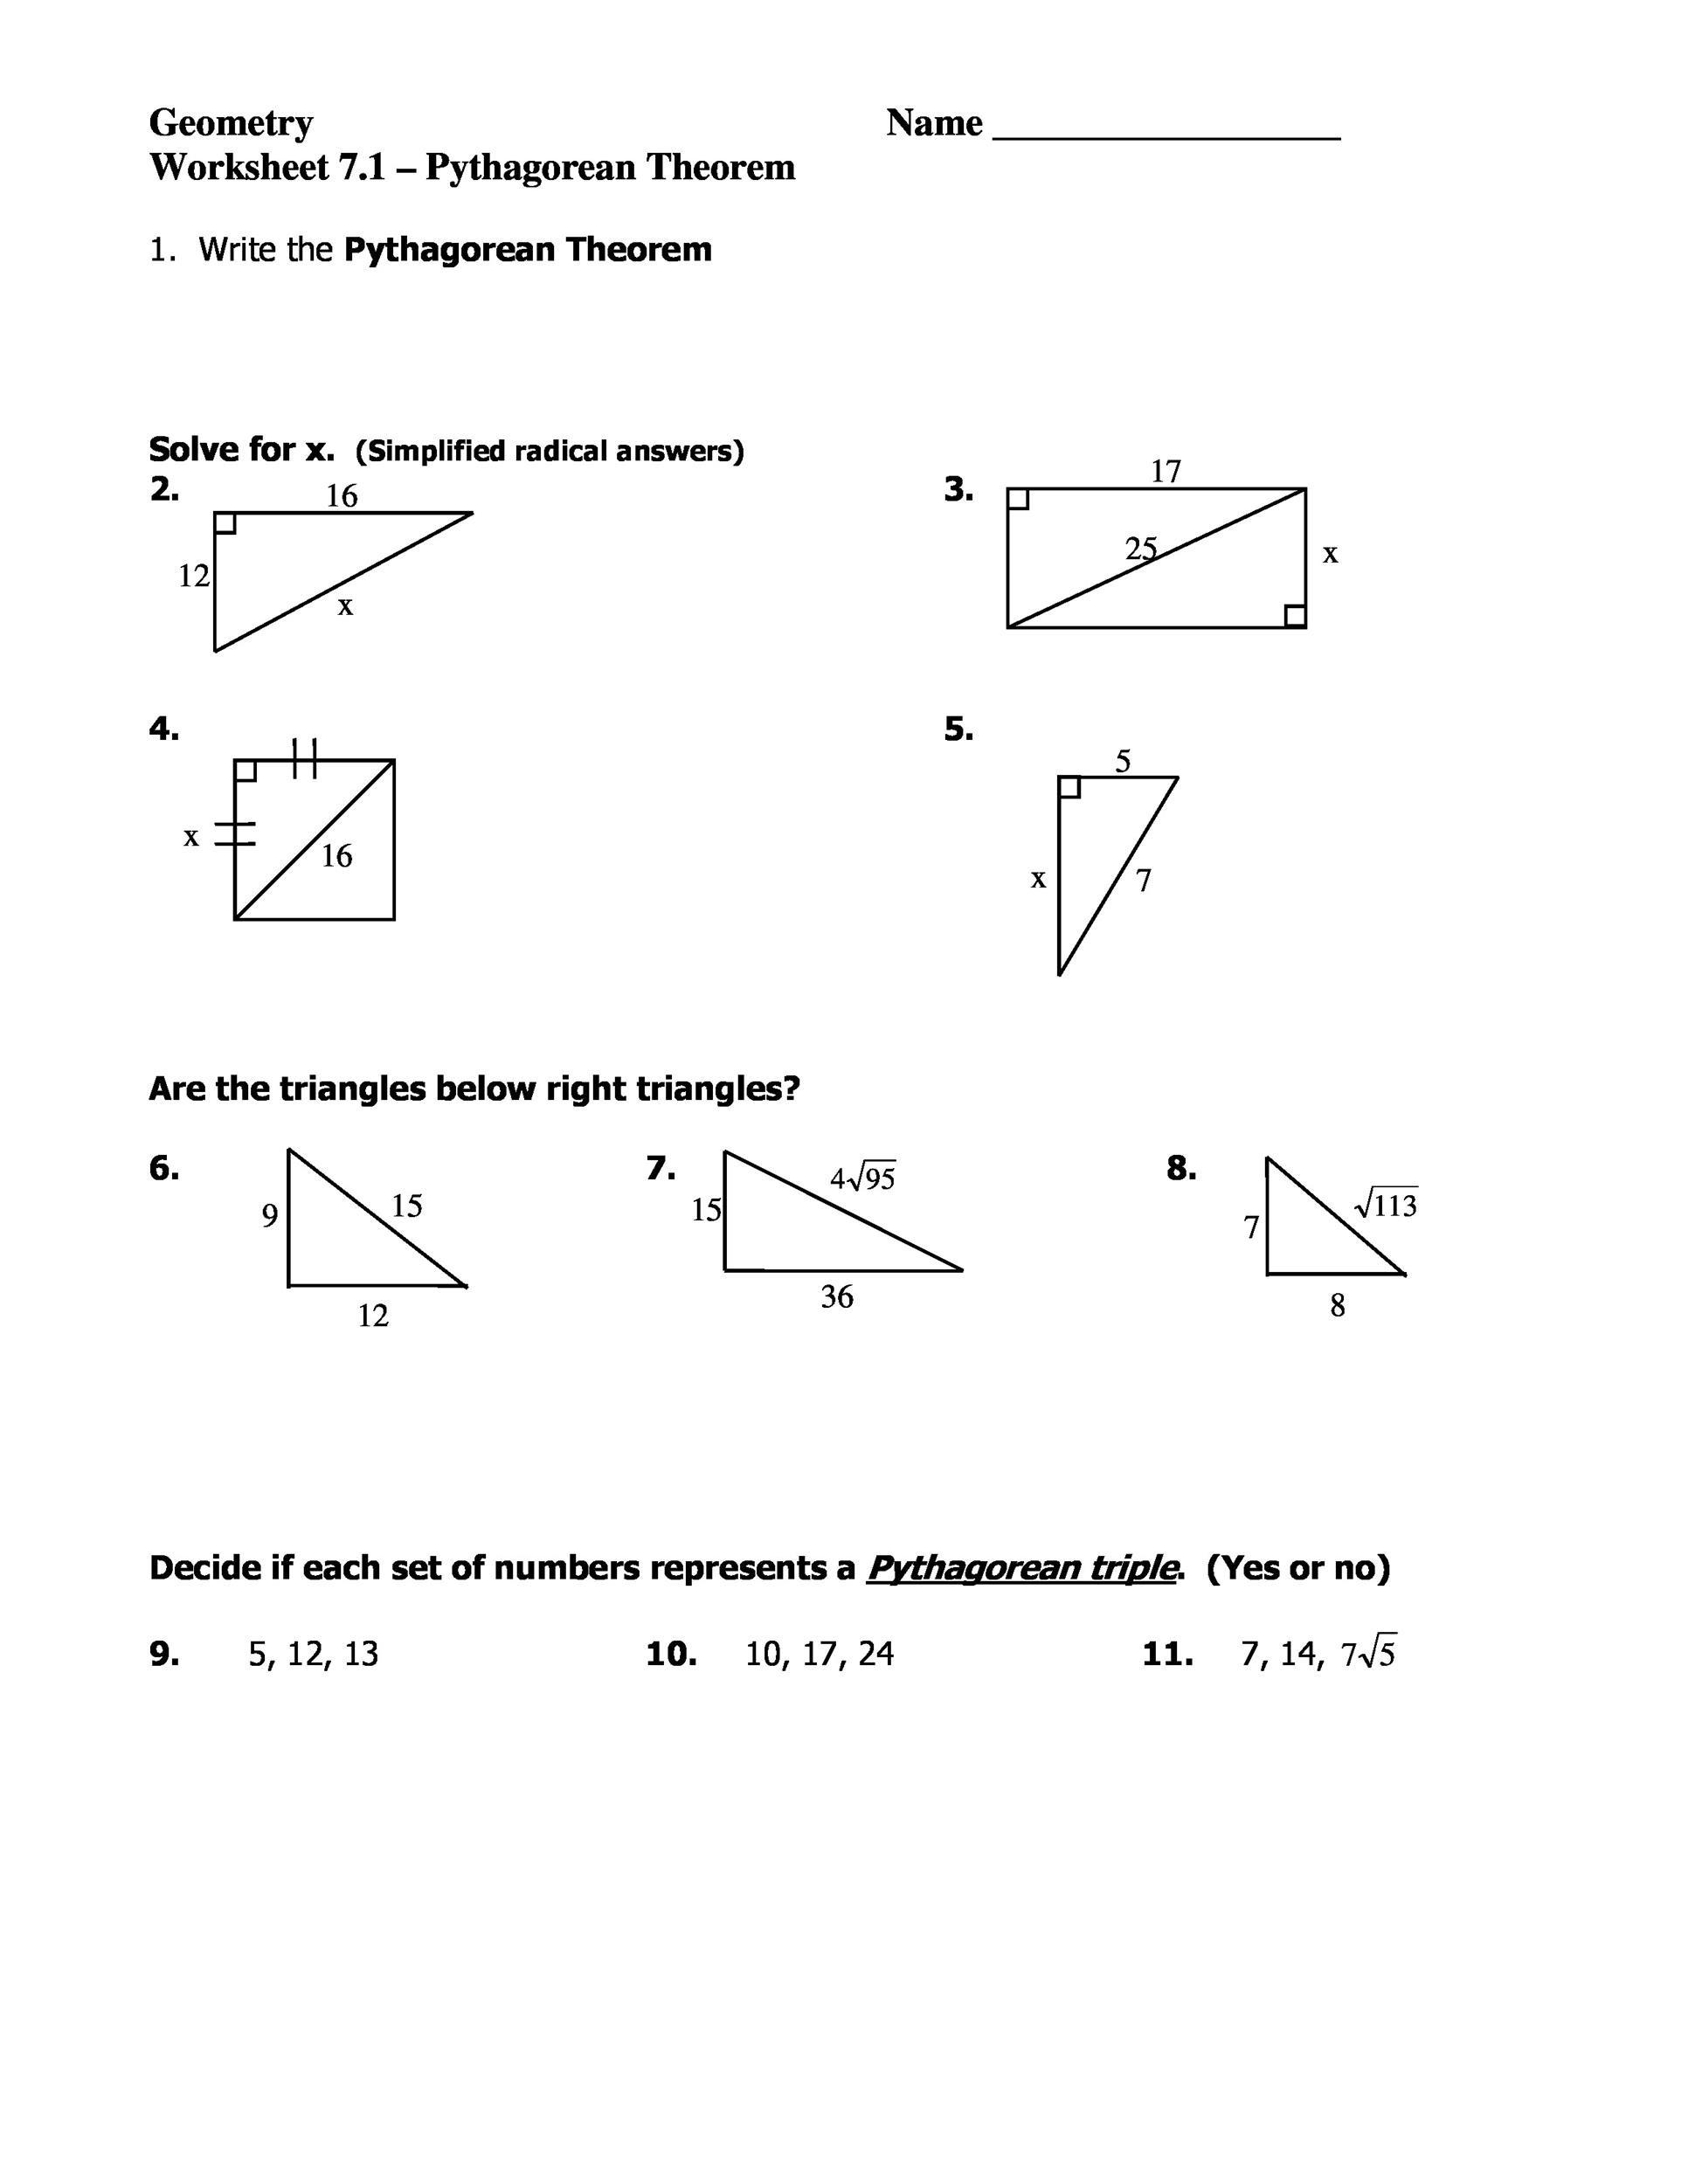 Pythagorean theorem Worksheet Answers Pythagorean theorem formula Worksheets